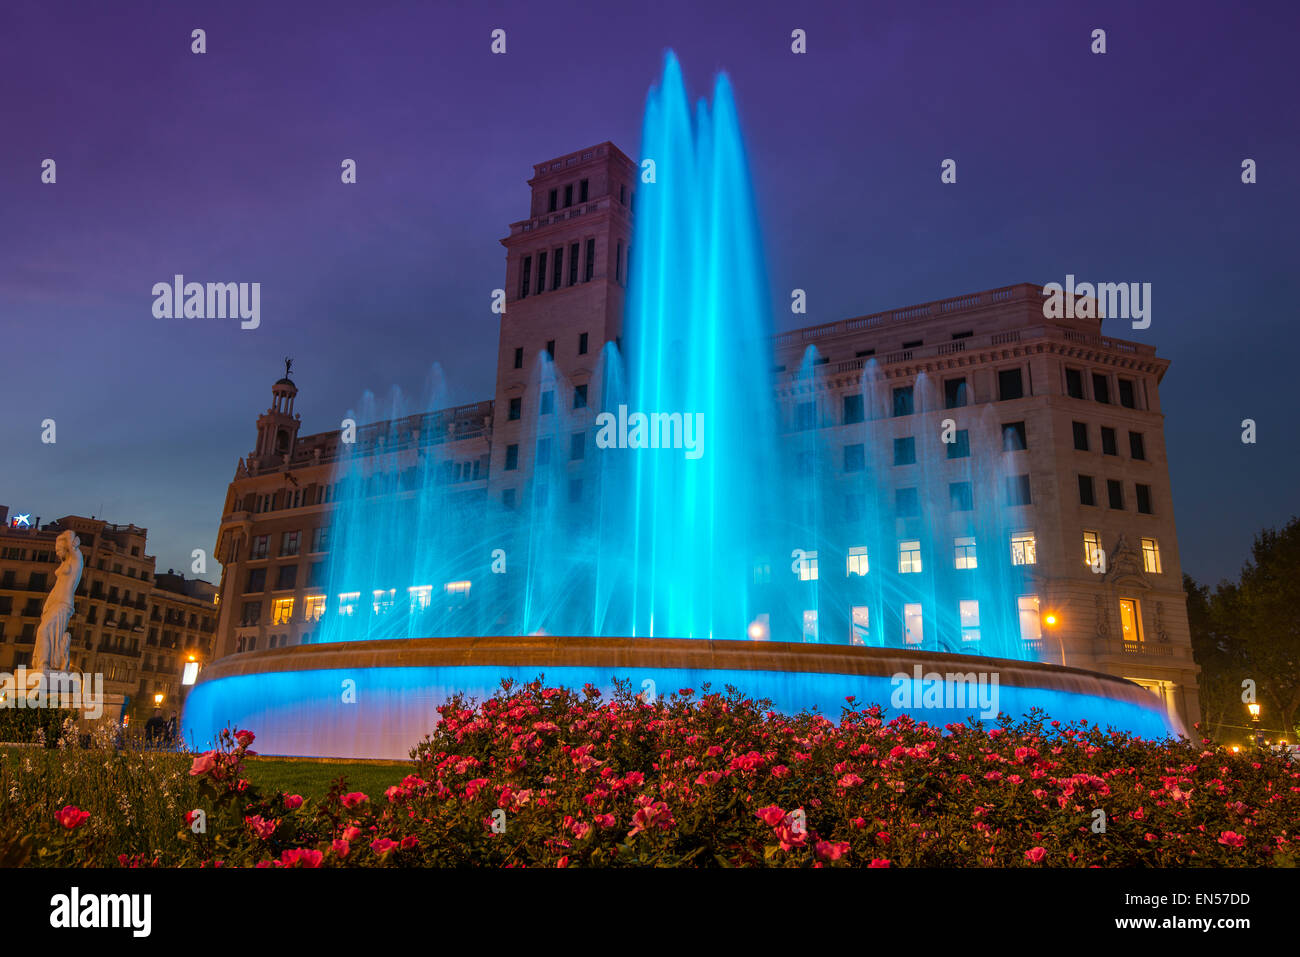 Licht-Show am neuen Brunnen Plaza Catalunya, Barcelona, Katalonien, Spanien Stockbild